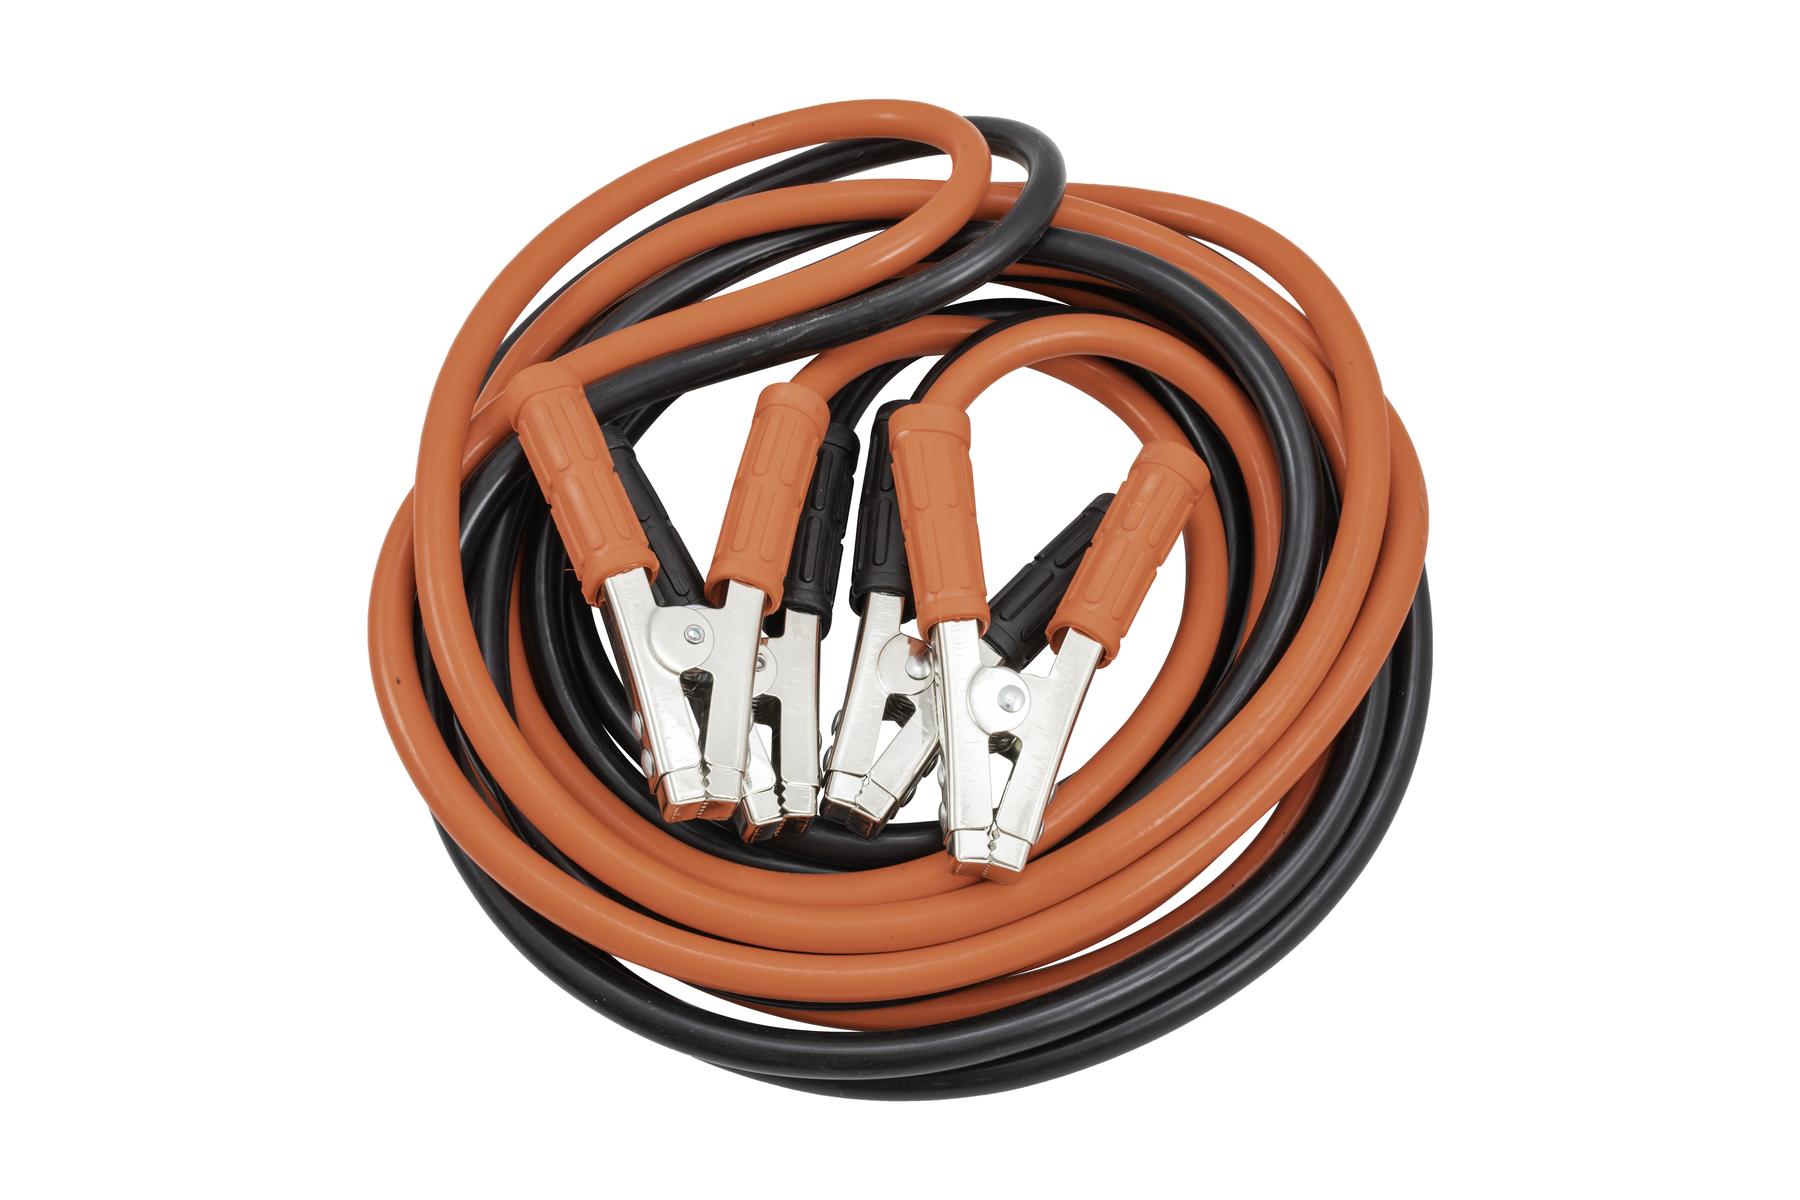 Startovací kabely 800A, délka 6 m - QUATROS QS14409